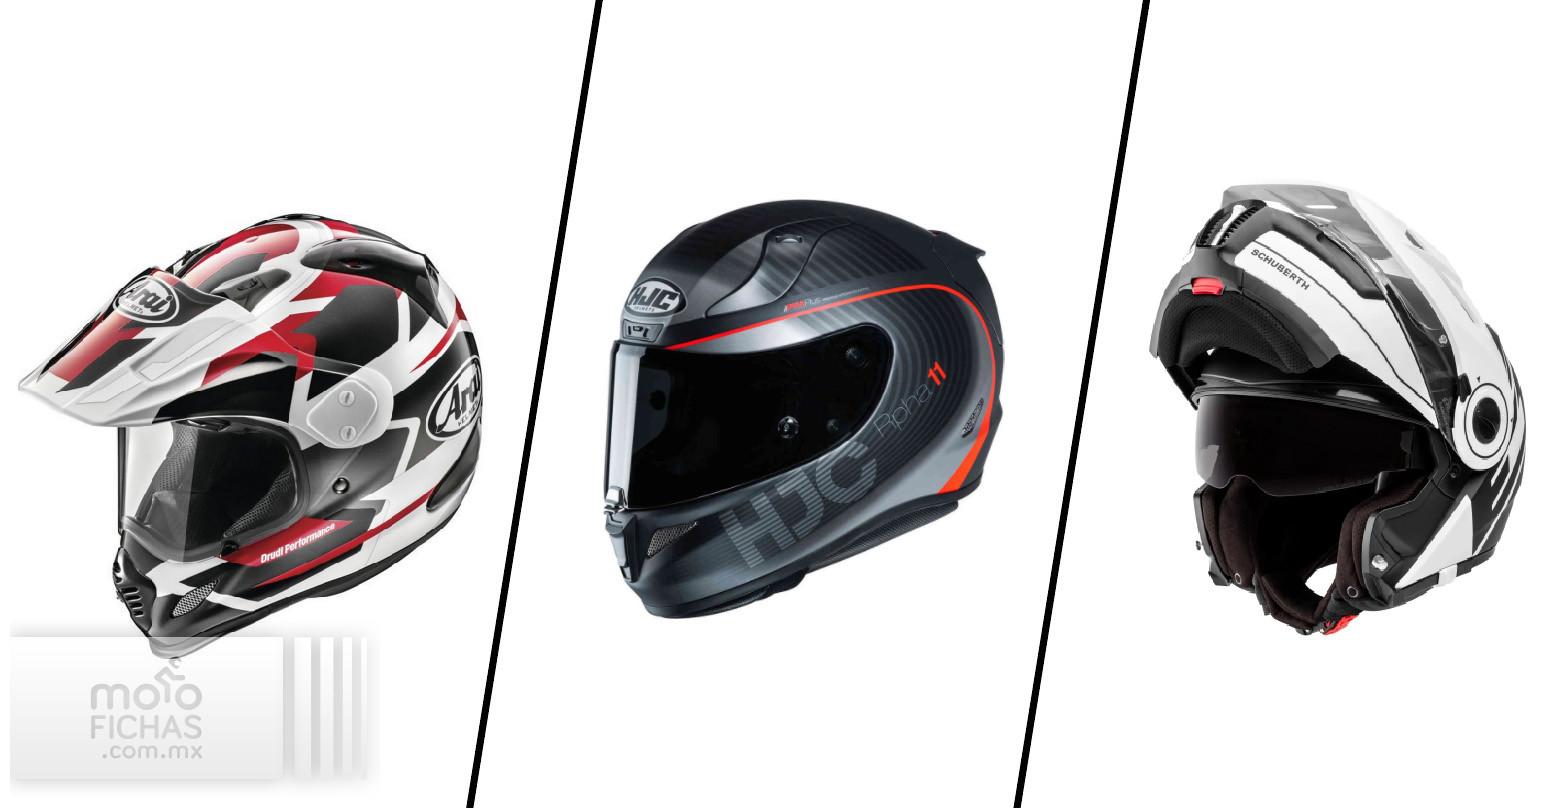 Diferencias entre tipos de cascos  (image)